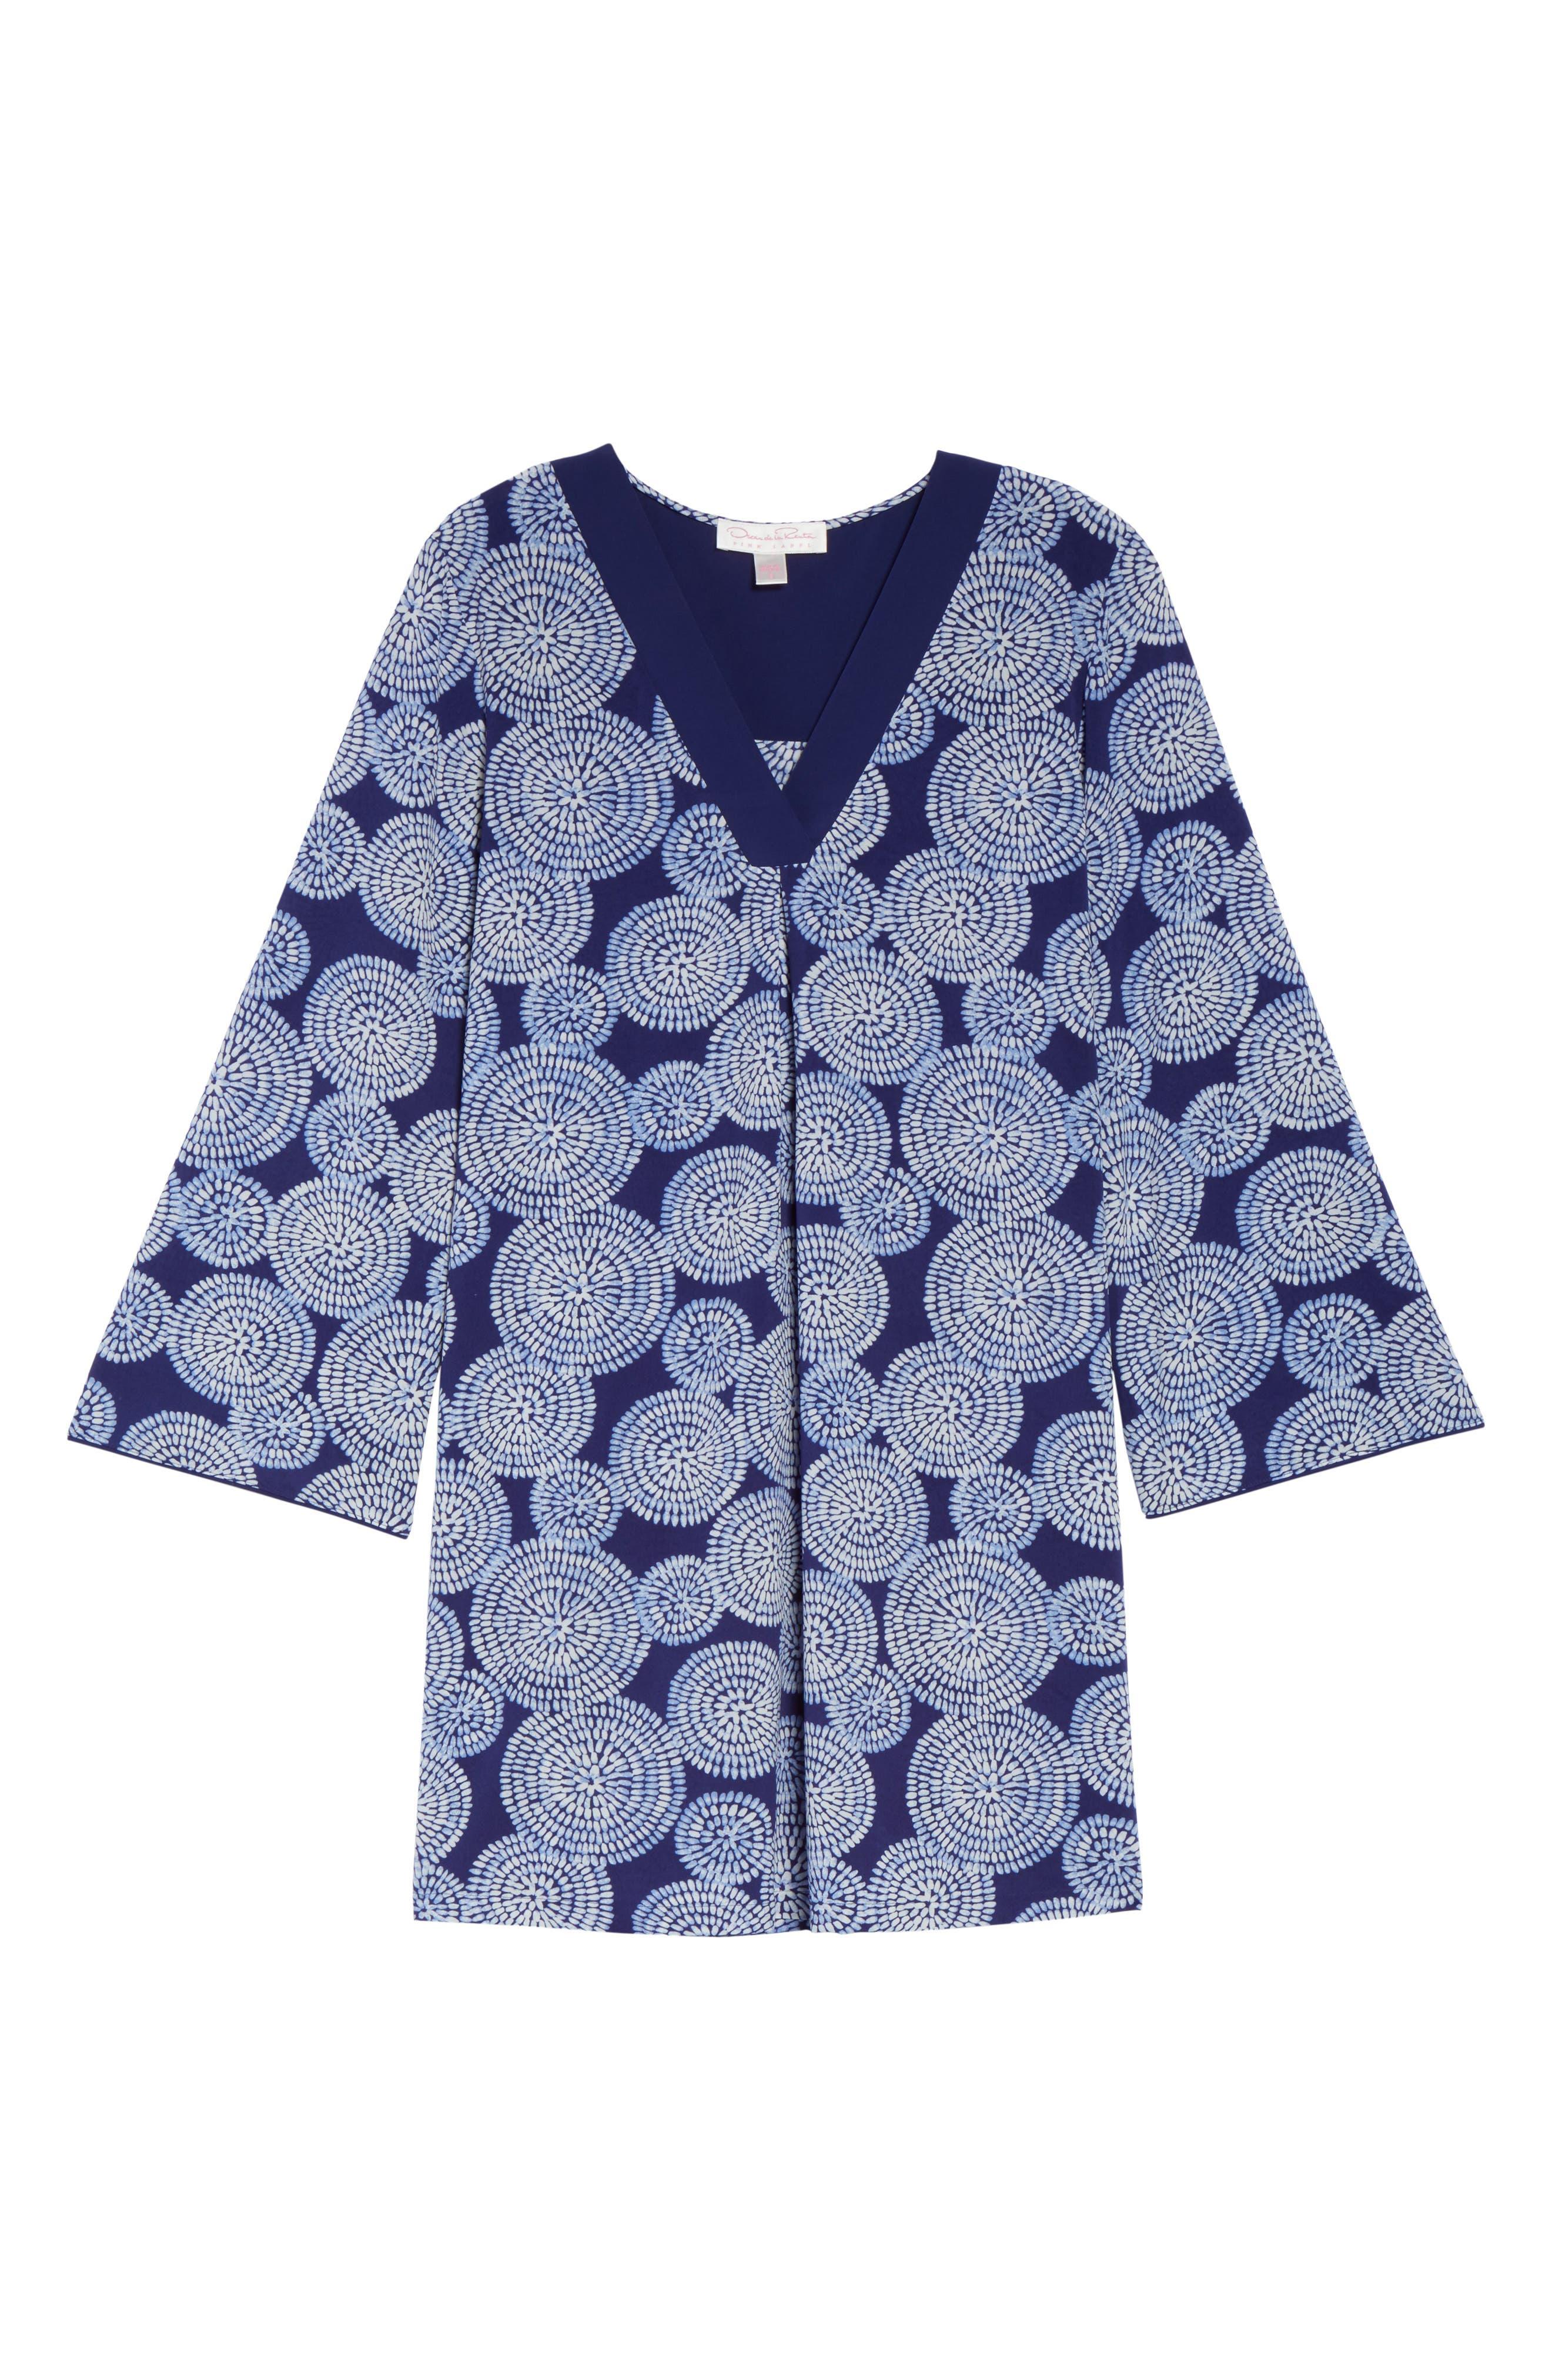 Sleepwear Halftan Short Nightgown,                             Alternate thumbnail 6, color,                             498